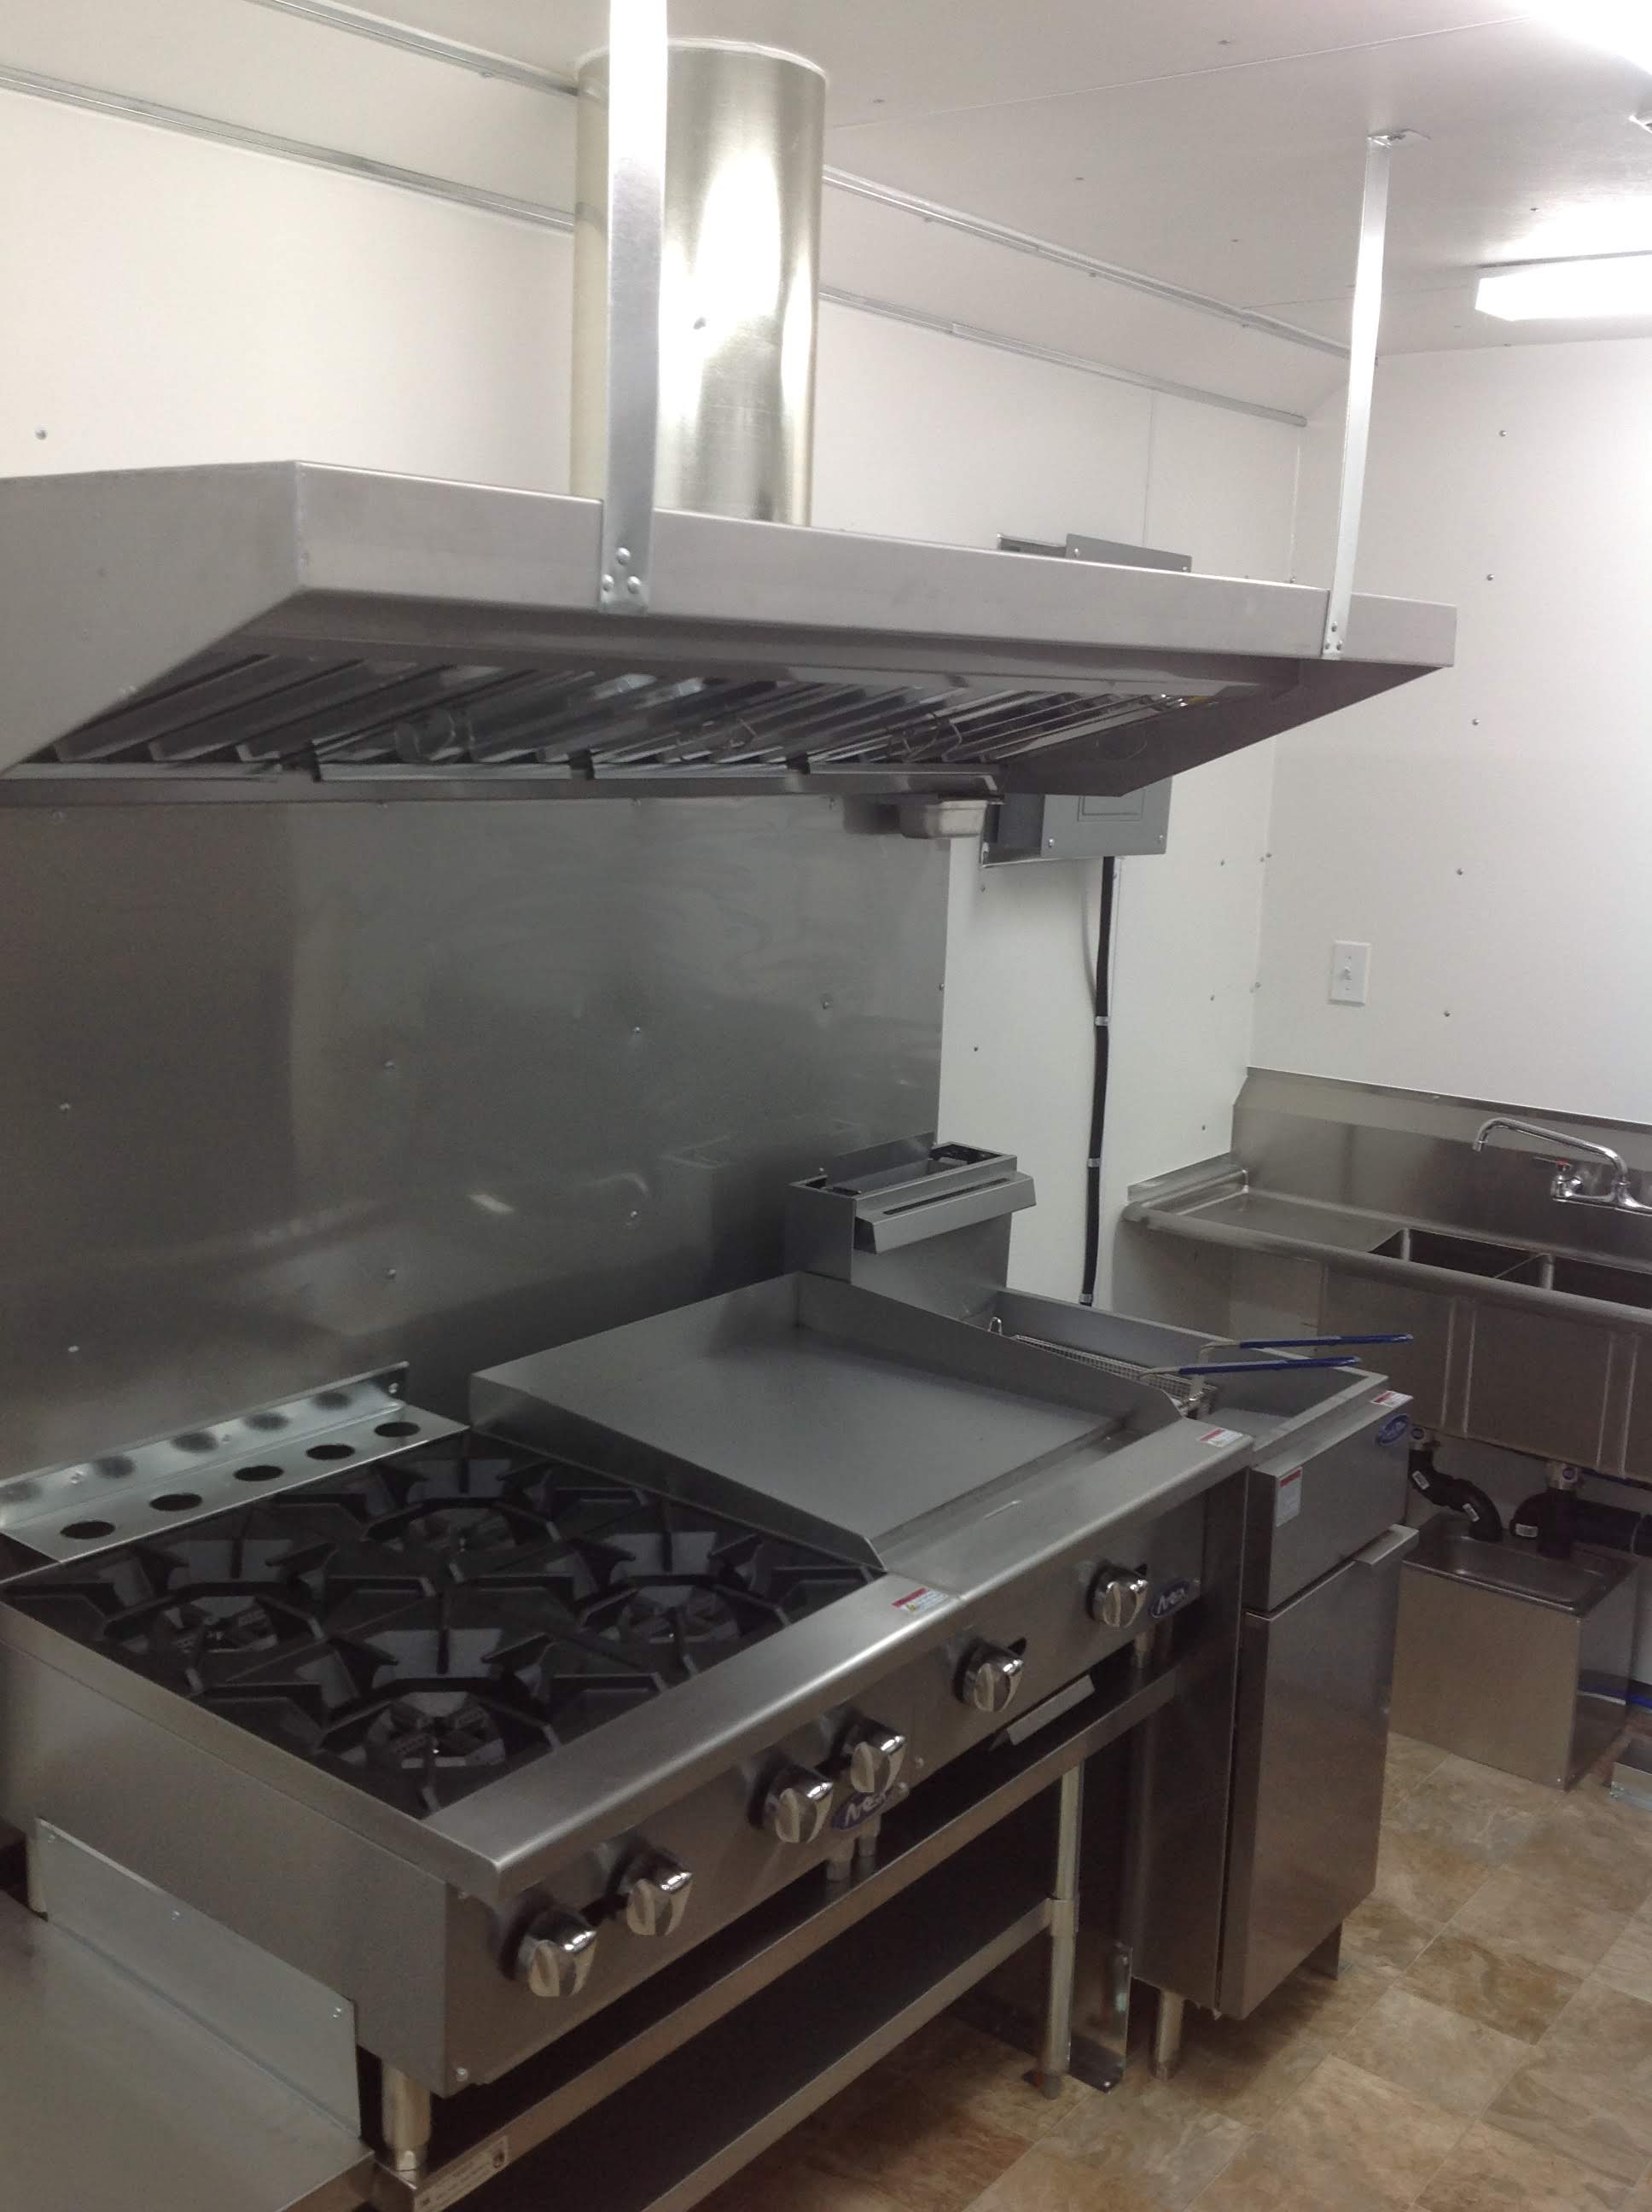 Trailer 10 Custom Kitchen Foodtruck 3